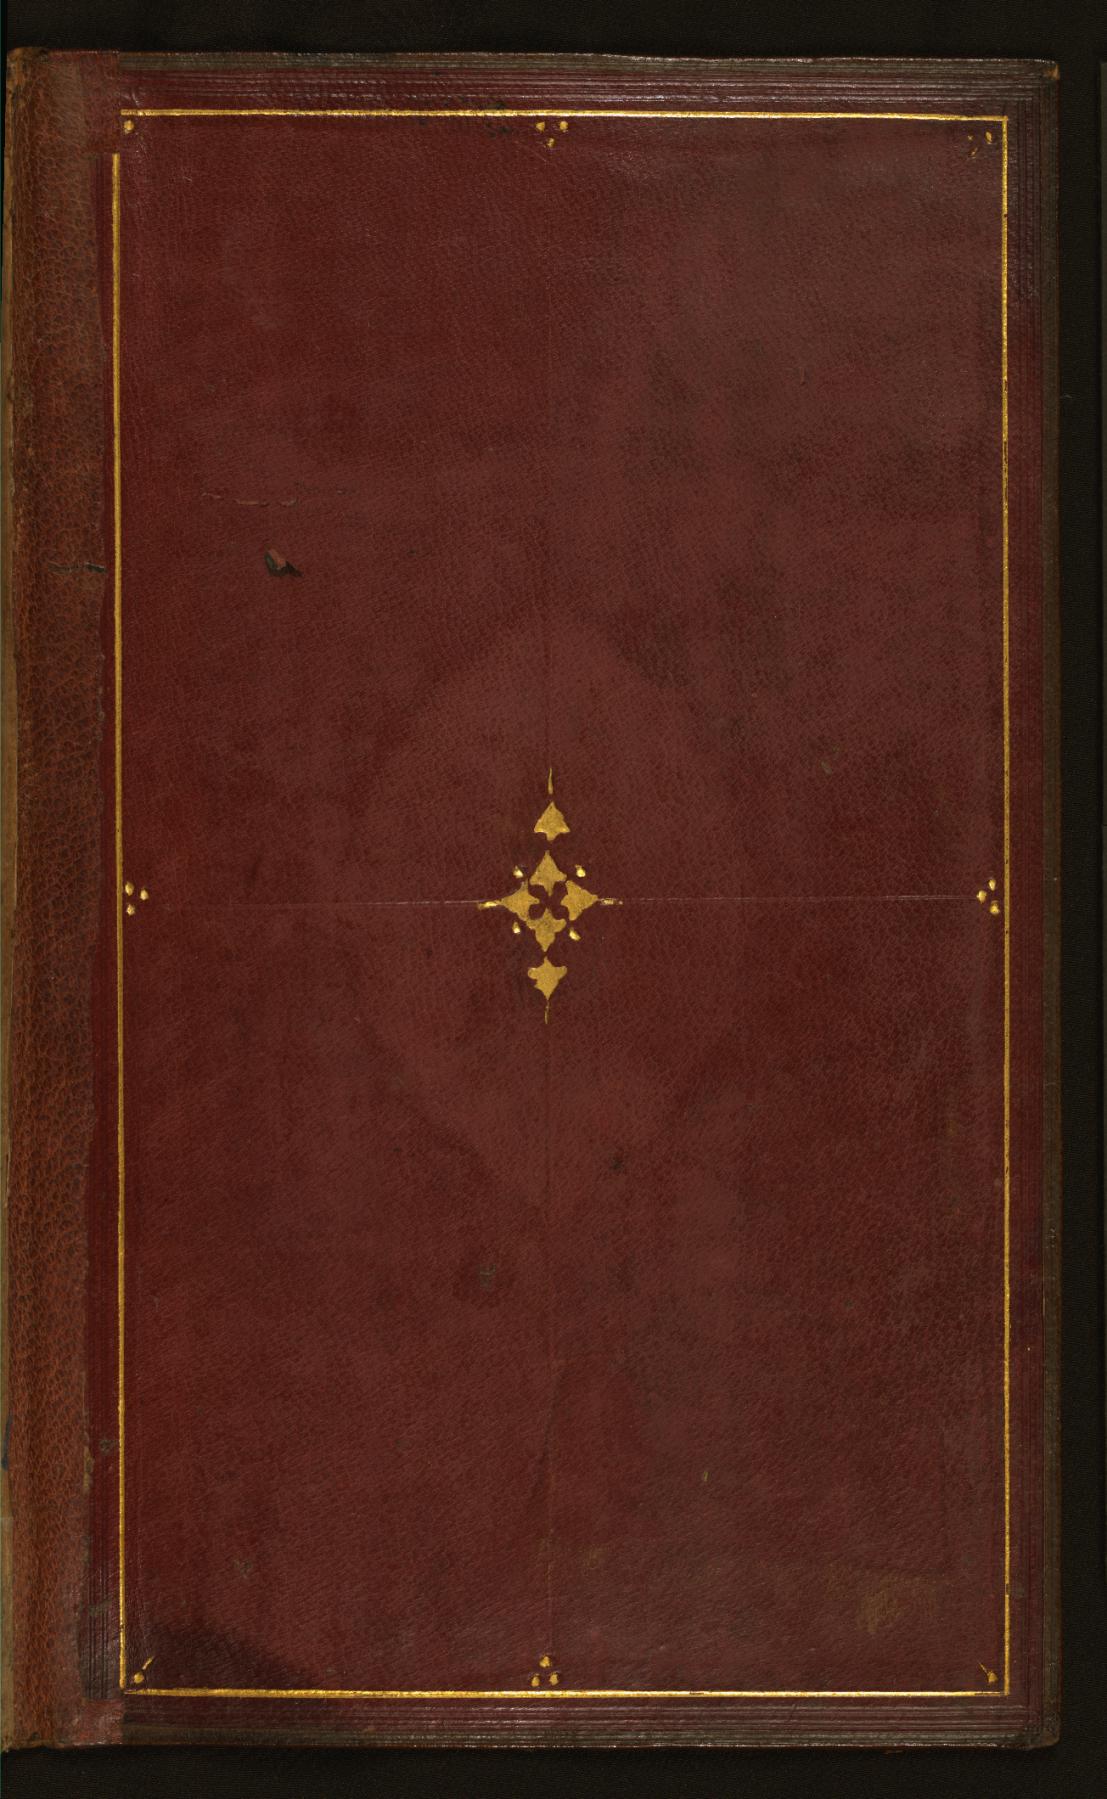 File:Ottoman - Binding from Book on Logic - Walters W591binding - Top  Interior.